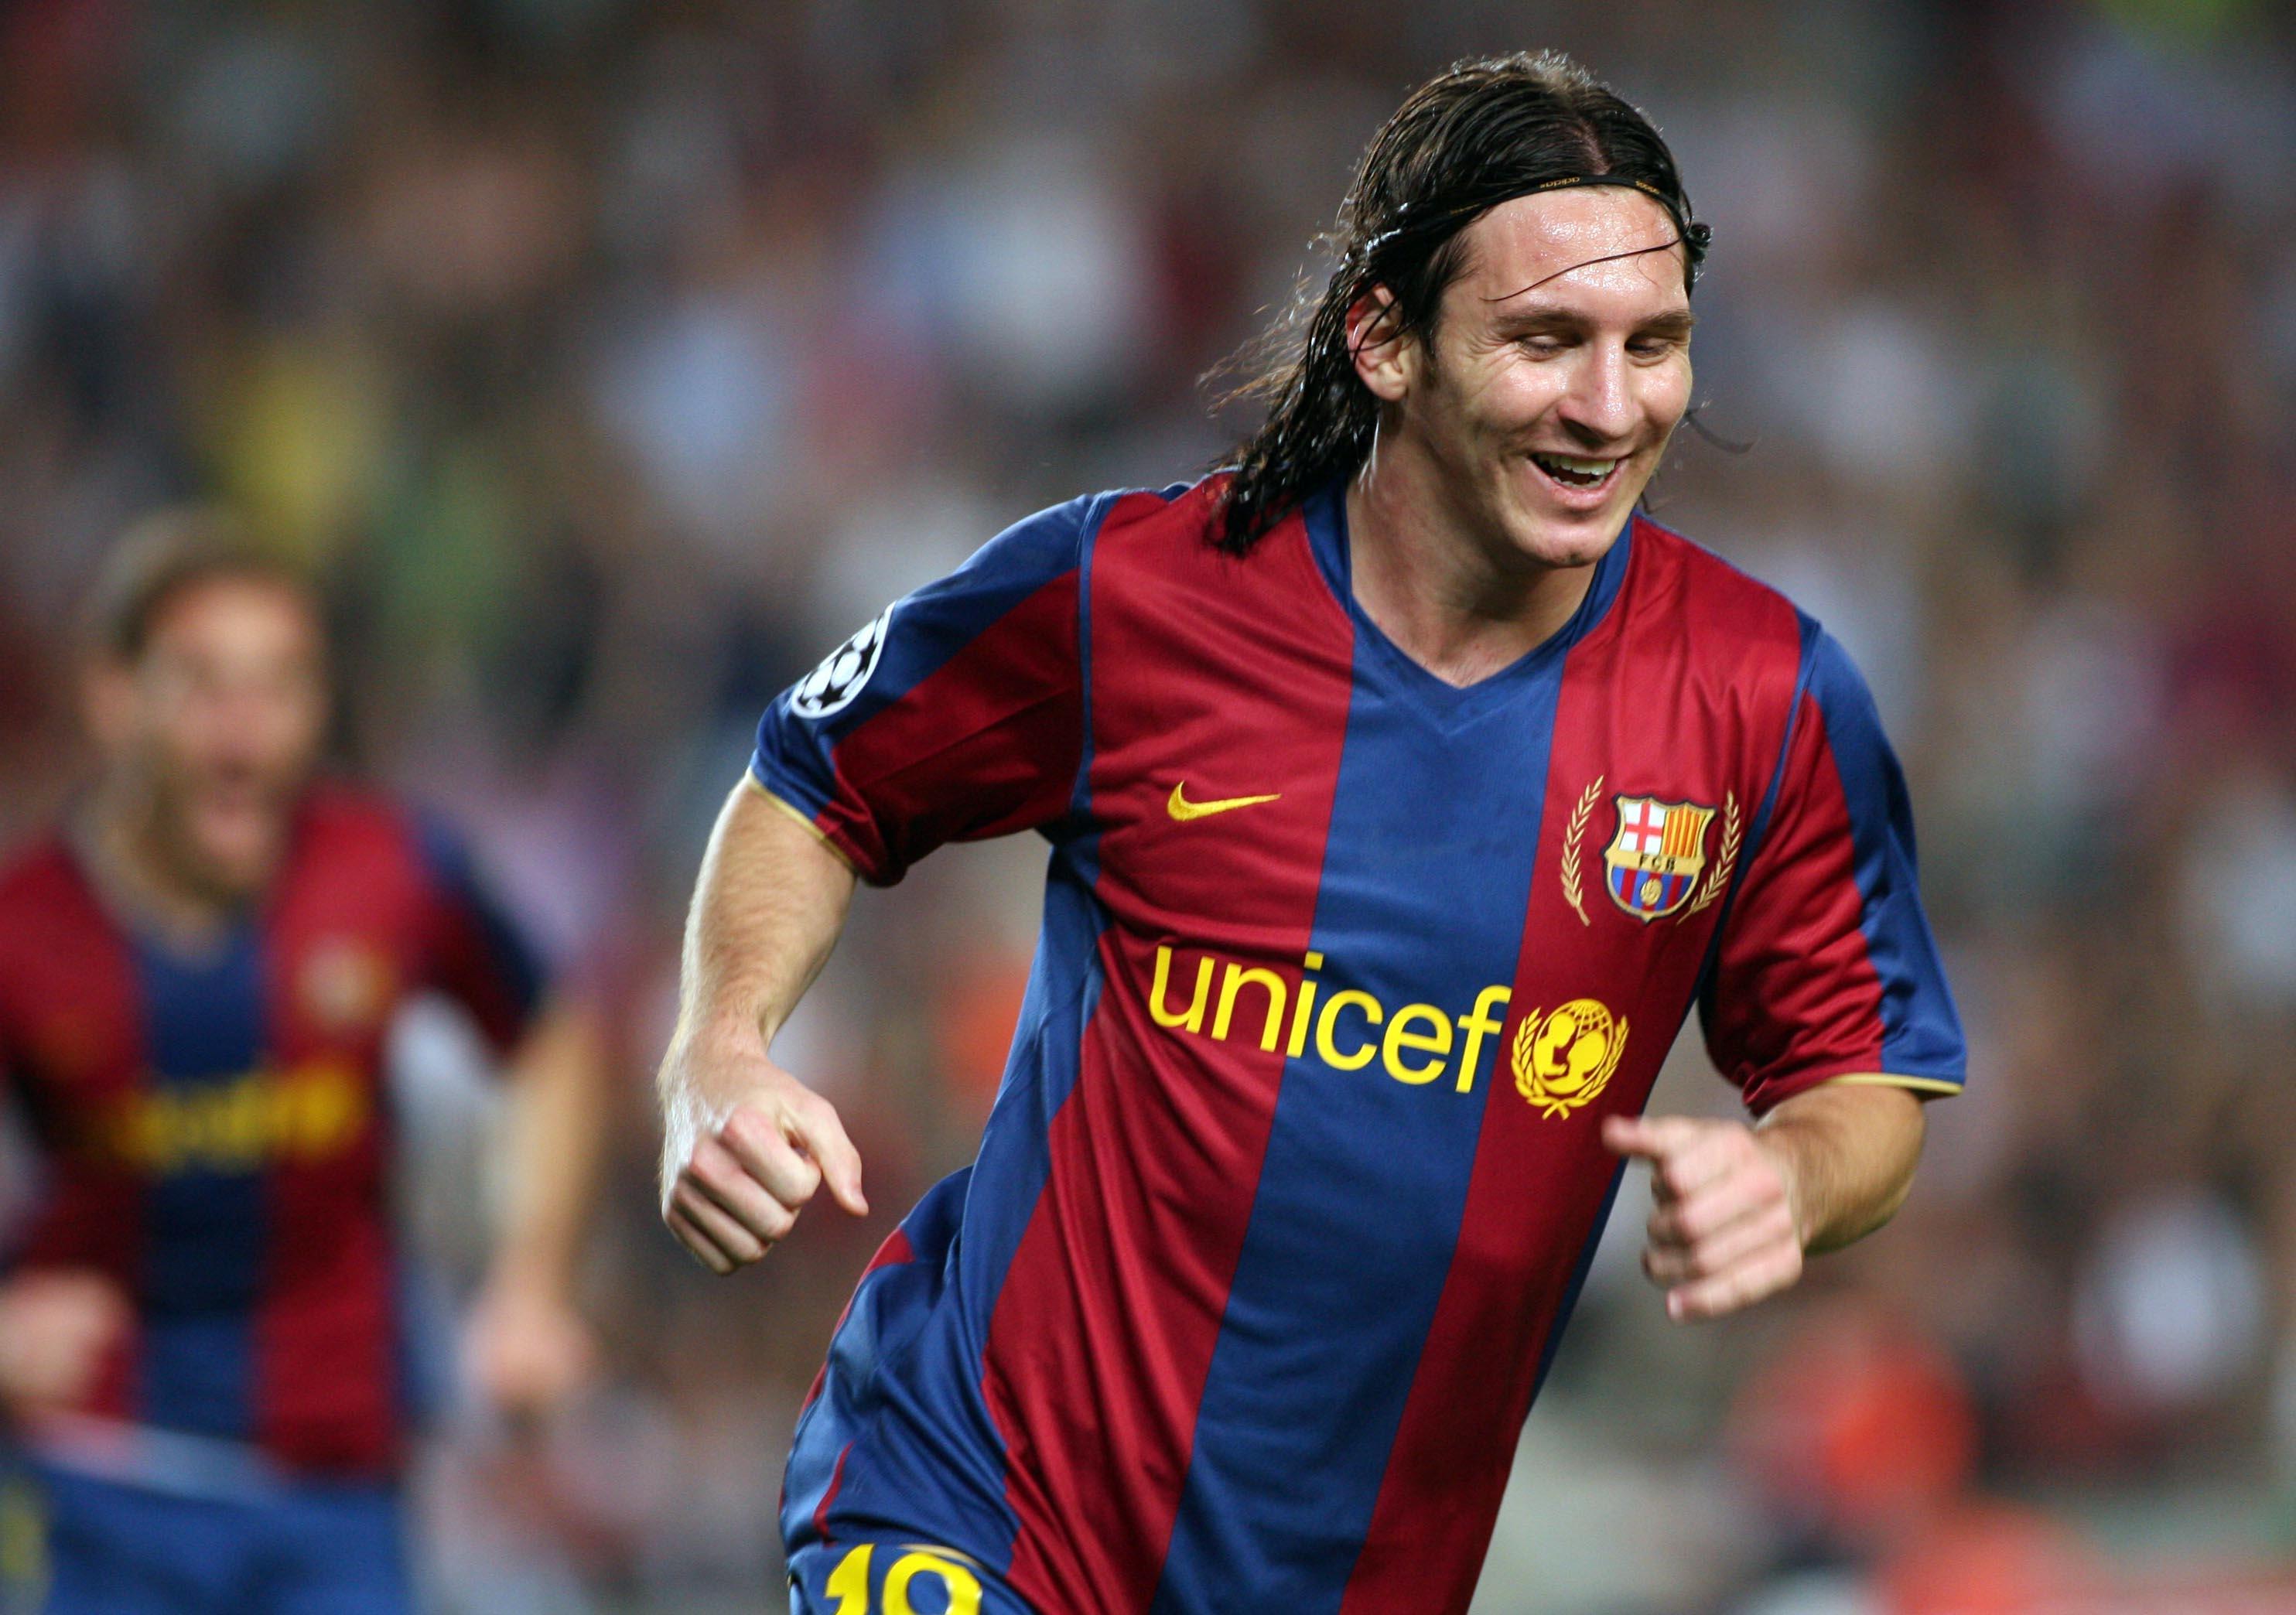 Fc Barcelona 3 Olympique Lyonnais 0 20072008 Full Match